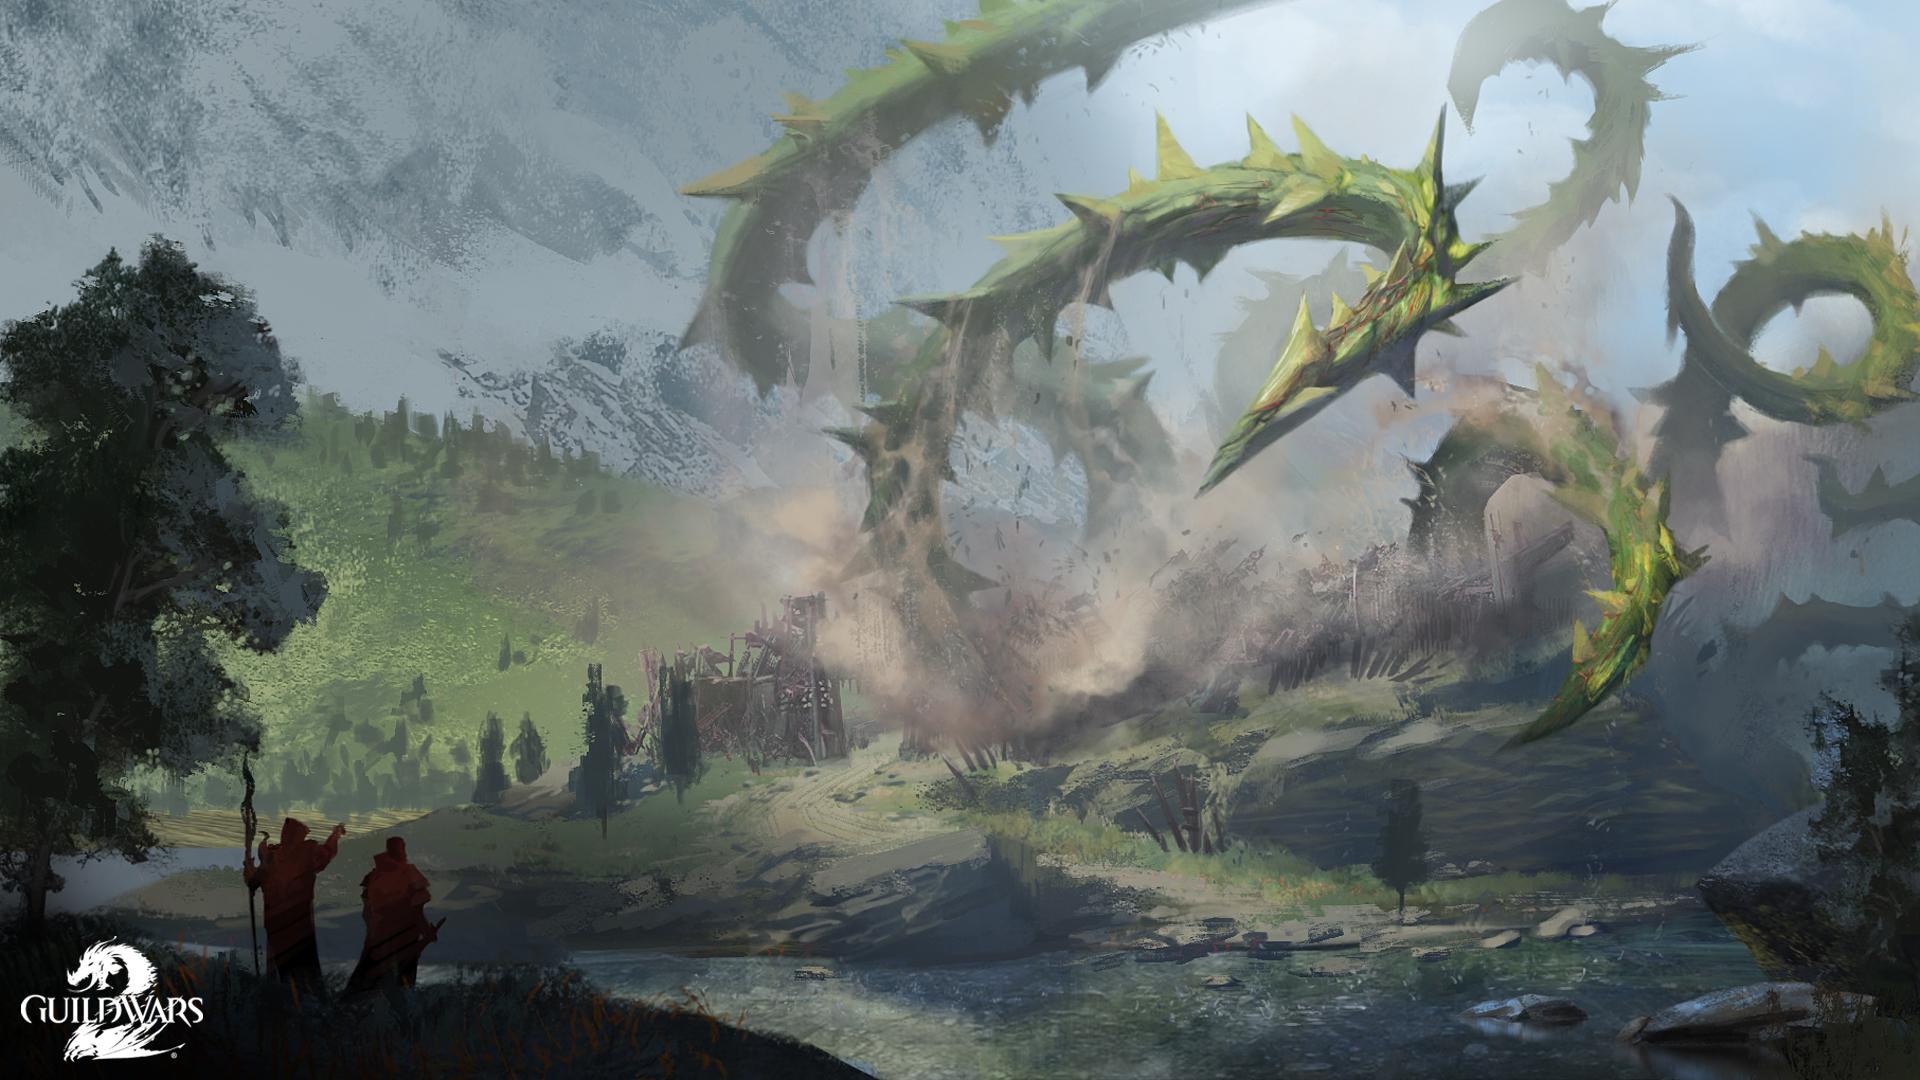 Léto s Guild Wars 2 9dbcbLiving World Season 2